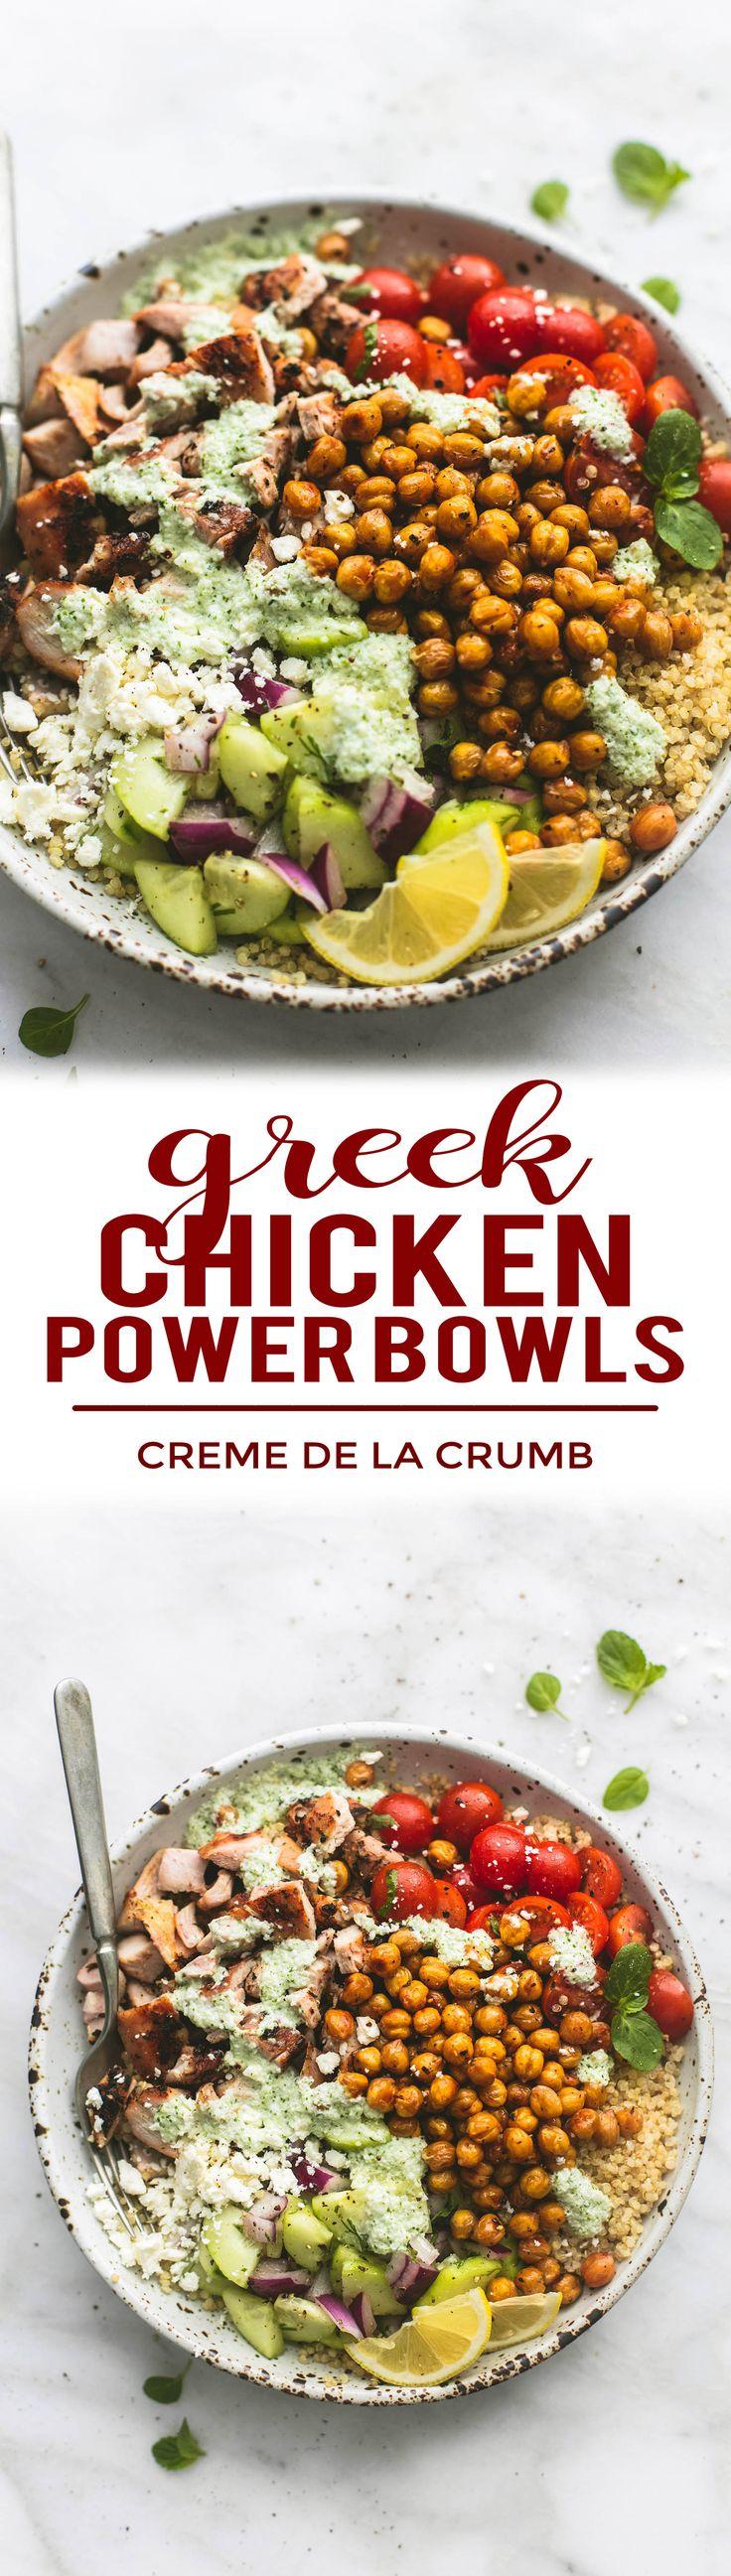 Easy and healthy Greek Chicken Power Bowls | lecremedelacrumb.com #chickendinner #healthyrecipes #easyrecipes